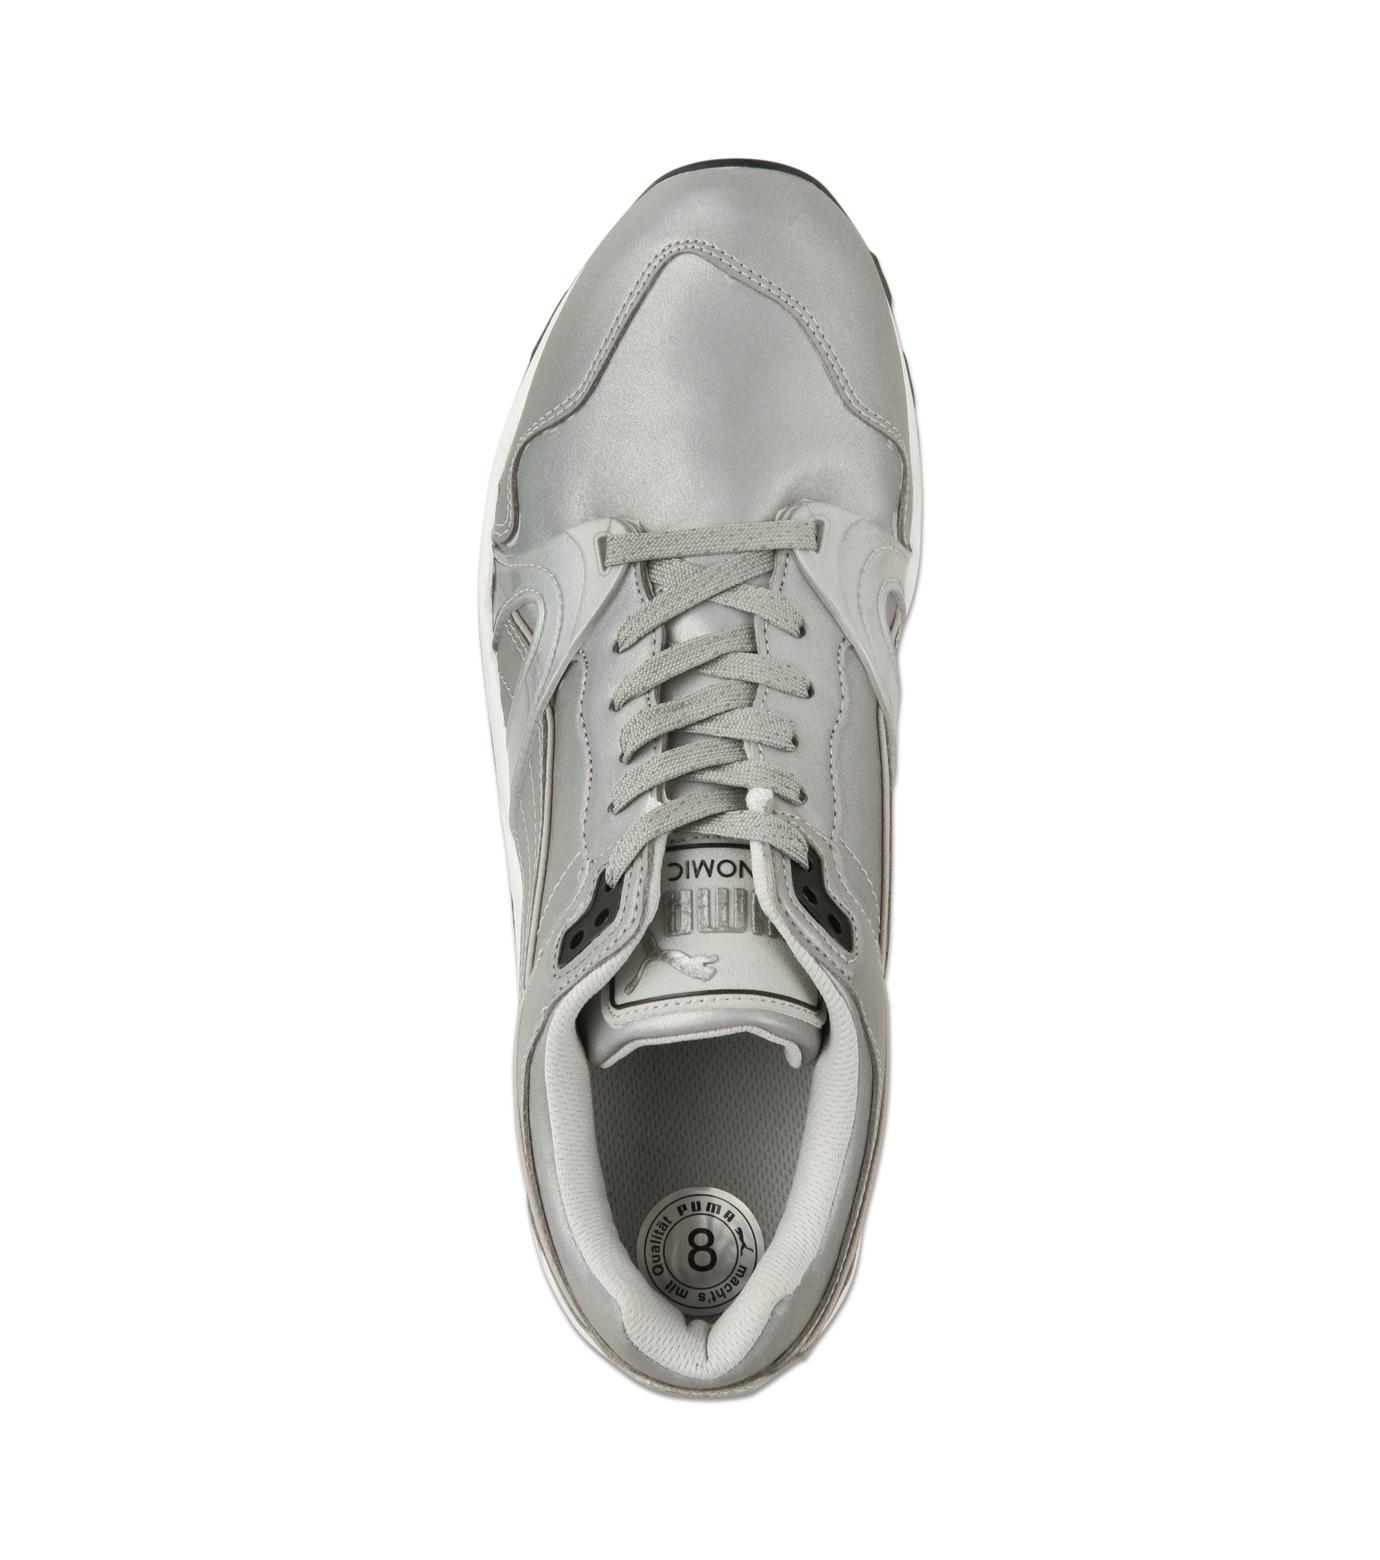 PUMA(プーマ)のXT1 Reflective-WHITE(シューズ/shoes)-358636-4 拡大詳細画像5